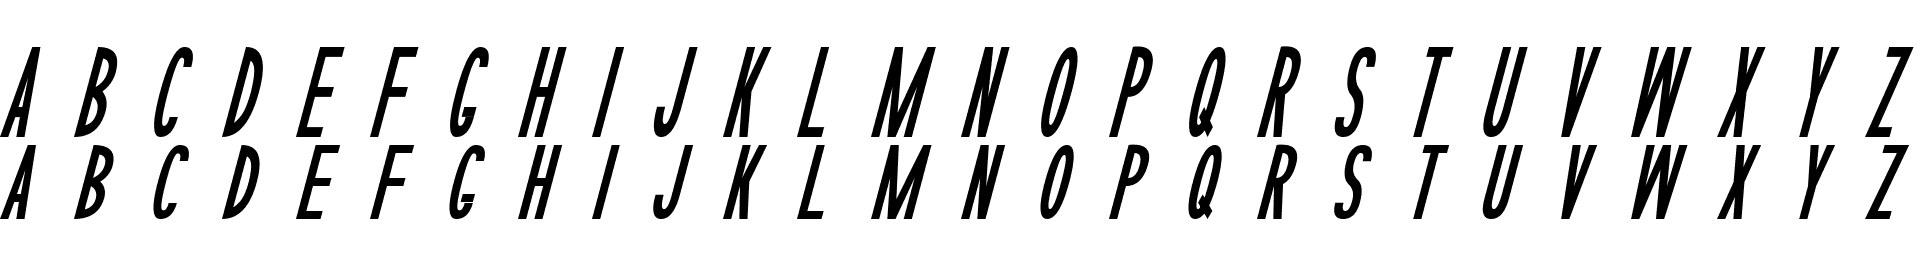 Sophisticated Slims Italic